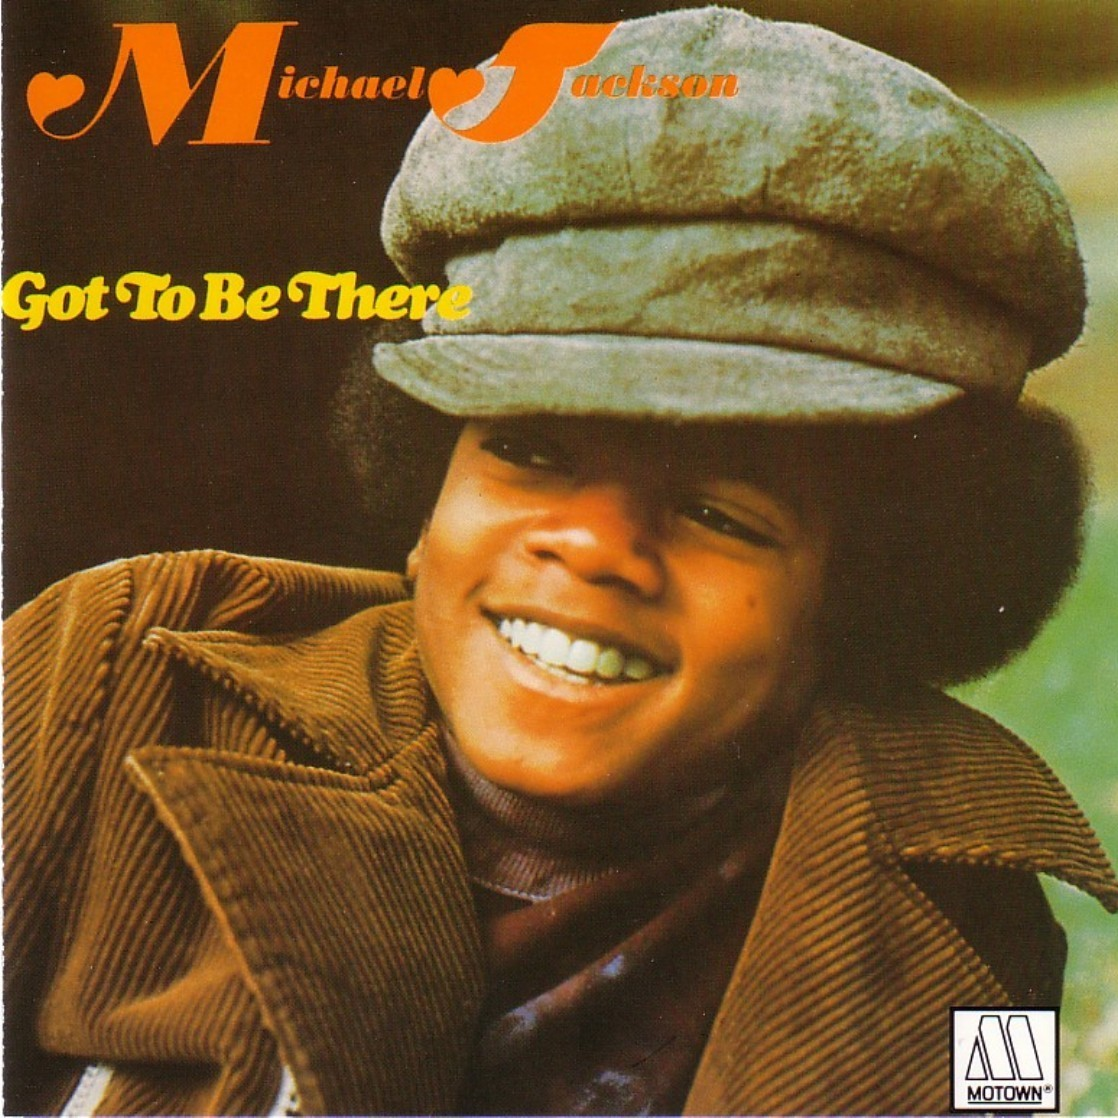 Michael Jackson  Thriller at Discogs